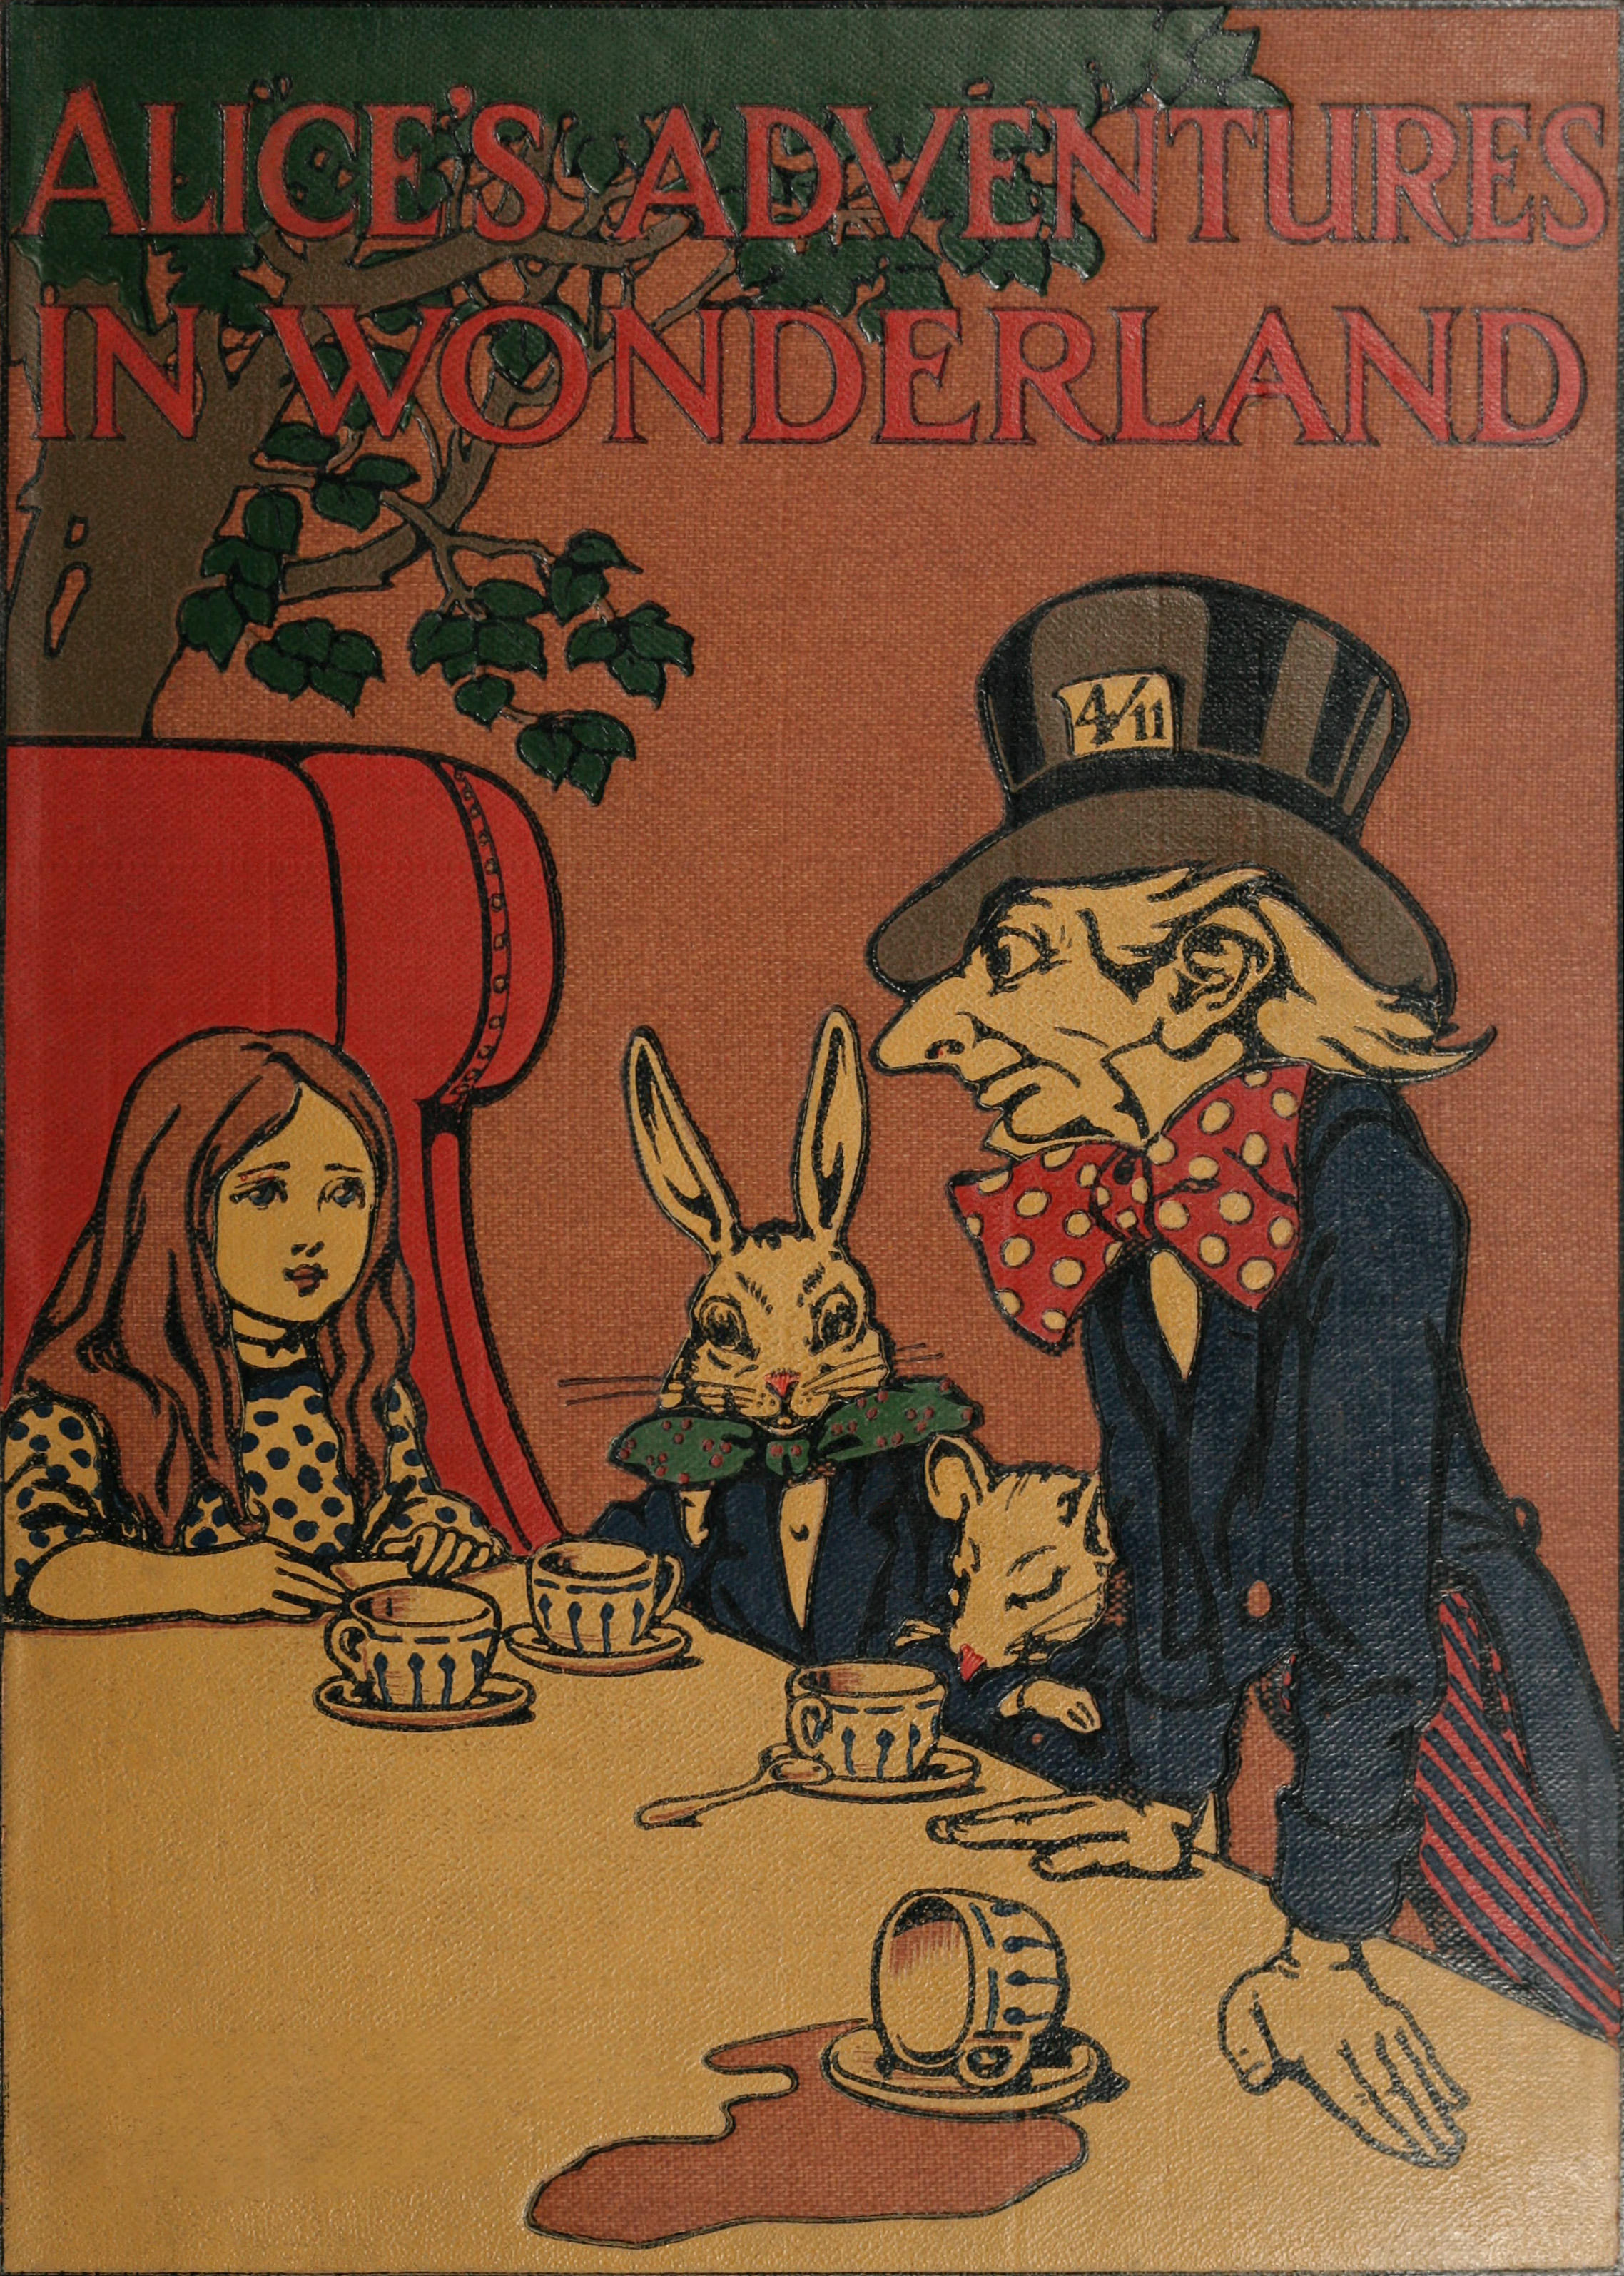 Alice's Adventures in Wonderland by Lewis Carroll, Part 2  Spokane Public Radio